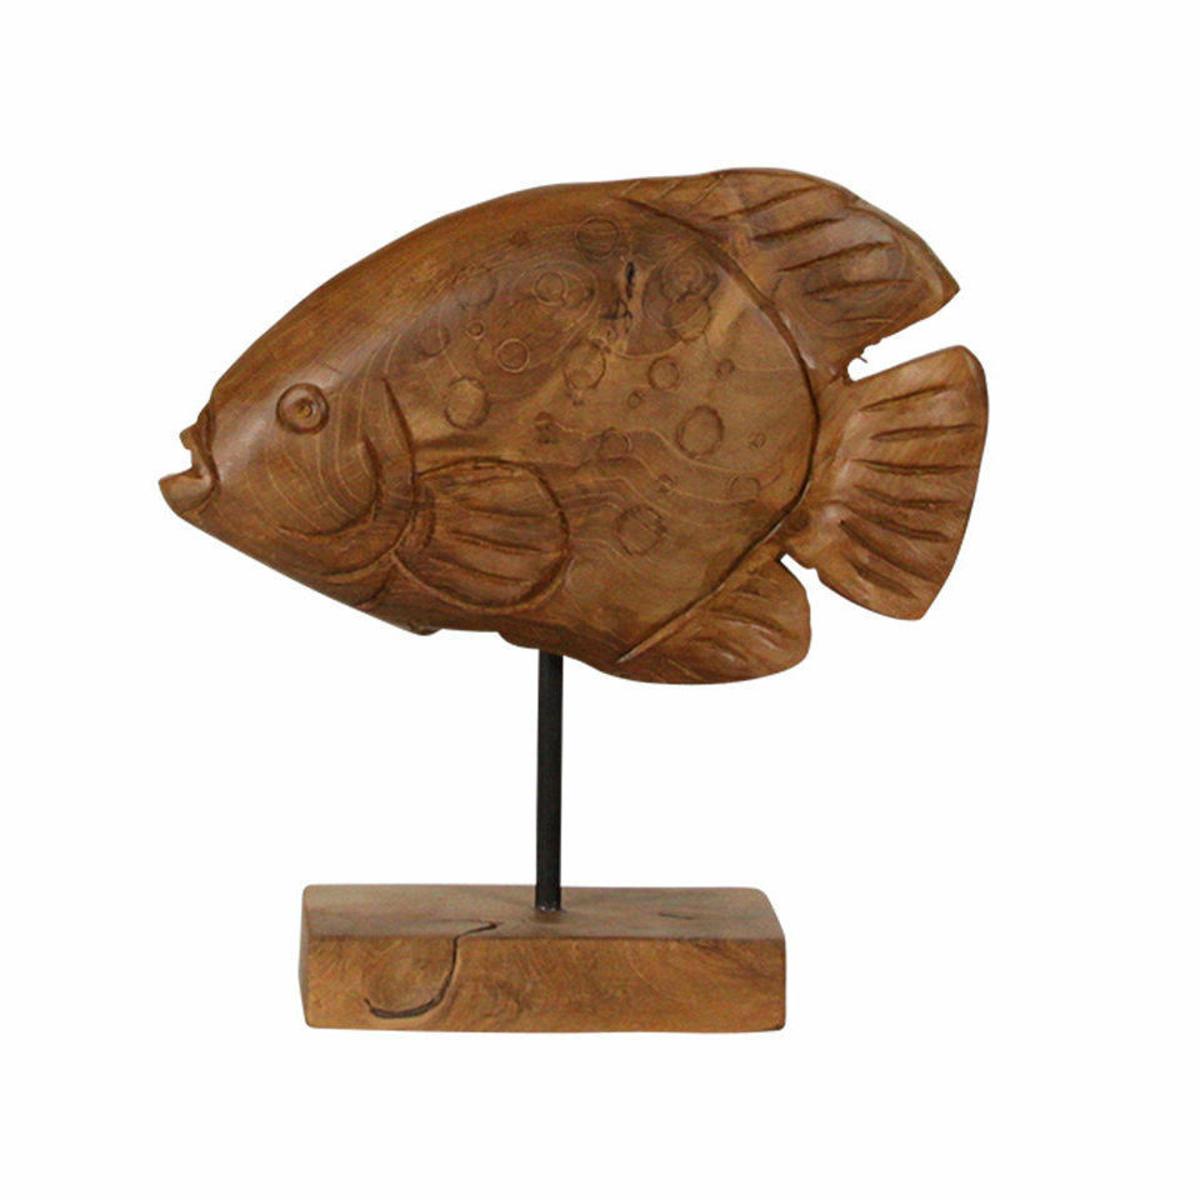 Picture of Pomfret Fish Sculpture